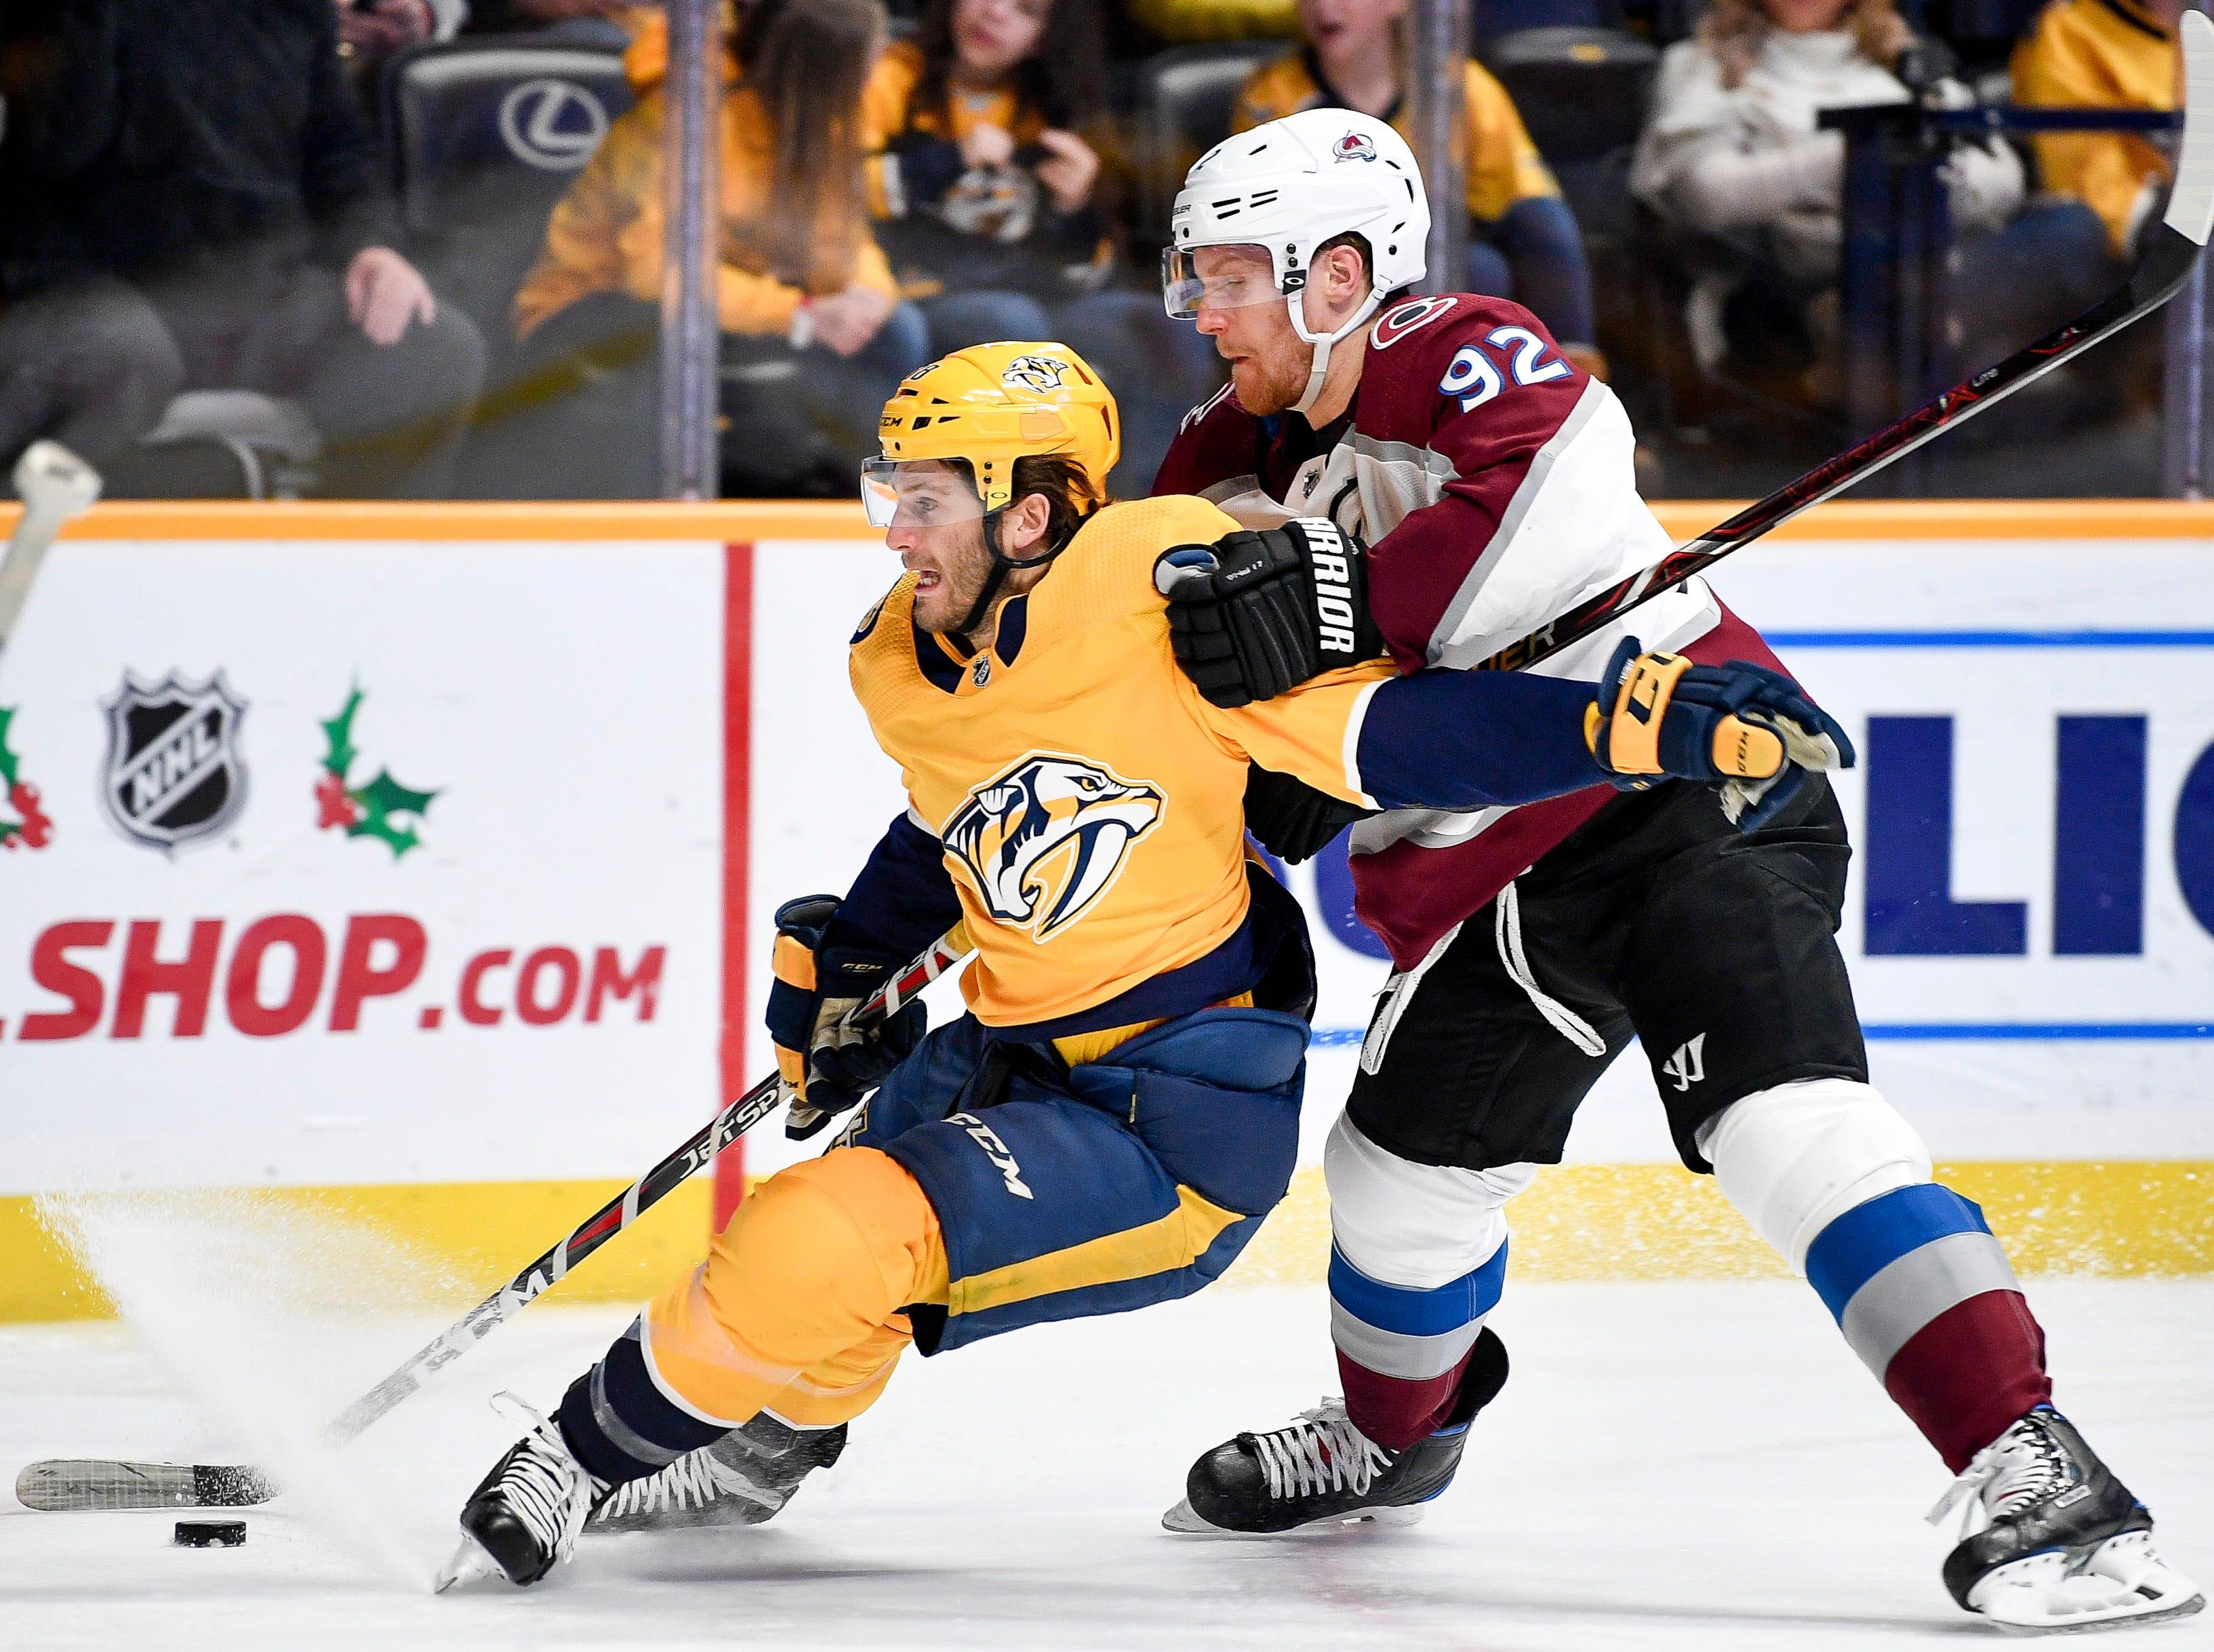 Nashville Predators right wing Ryan Hartman (38) battles Colorado Avalanche left wing Gabriel Landeskog (92) during the third period at Bridgestone Arena in Nashville, Tenn., Tuesday, Nov. 27, 2018.